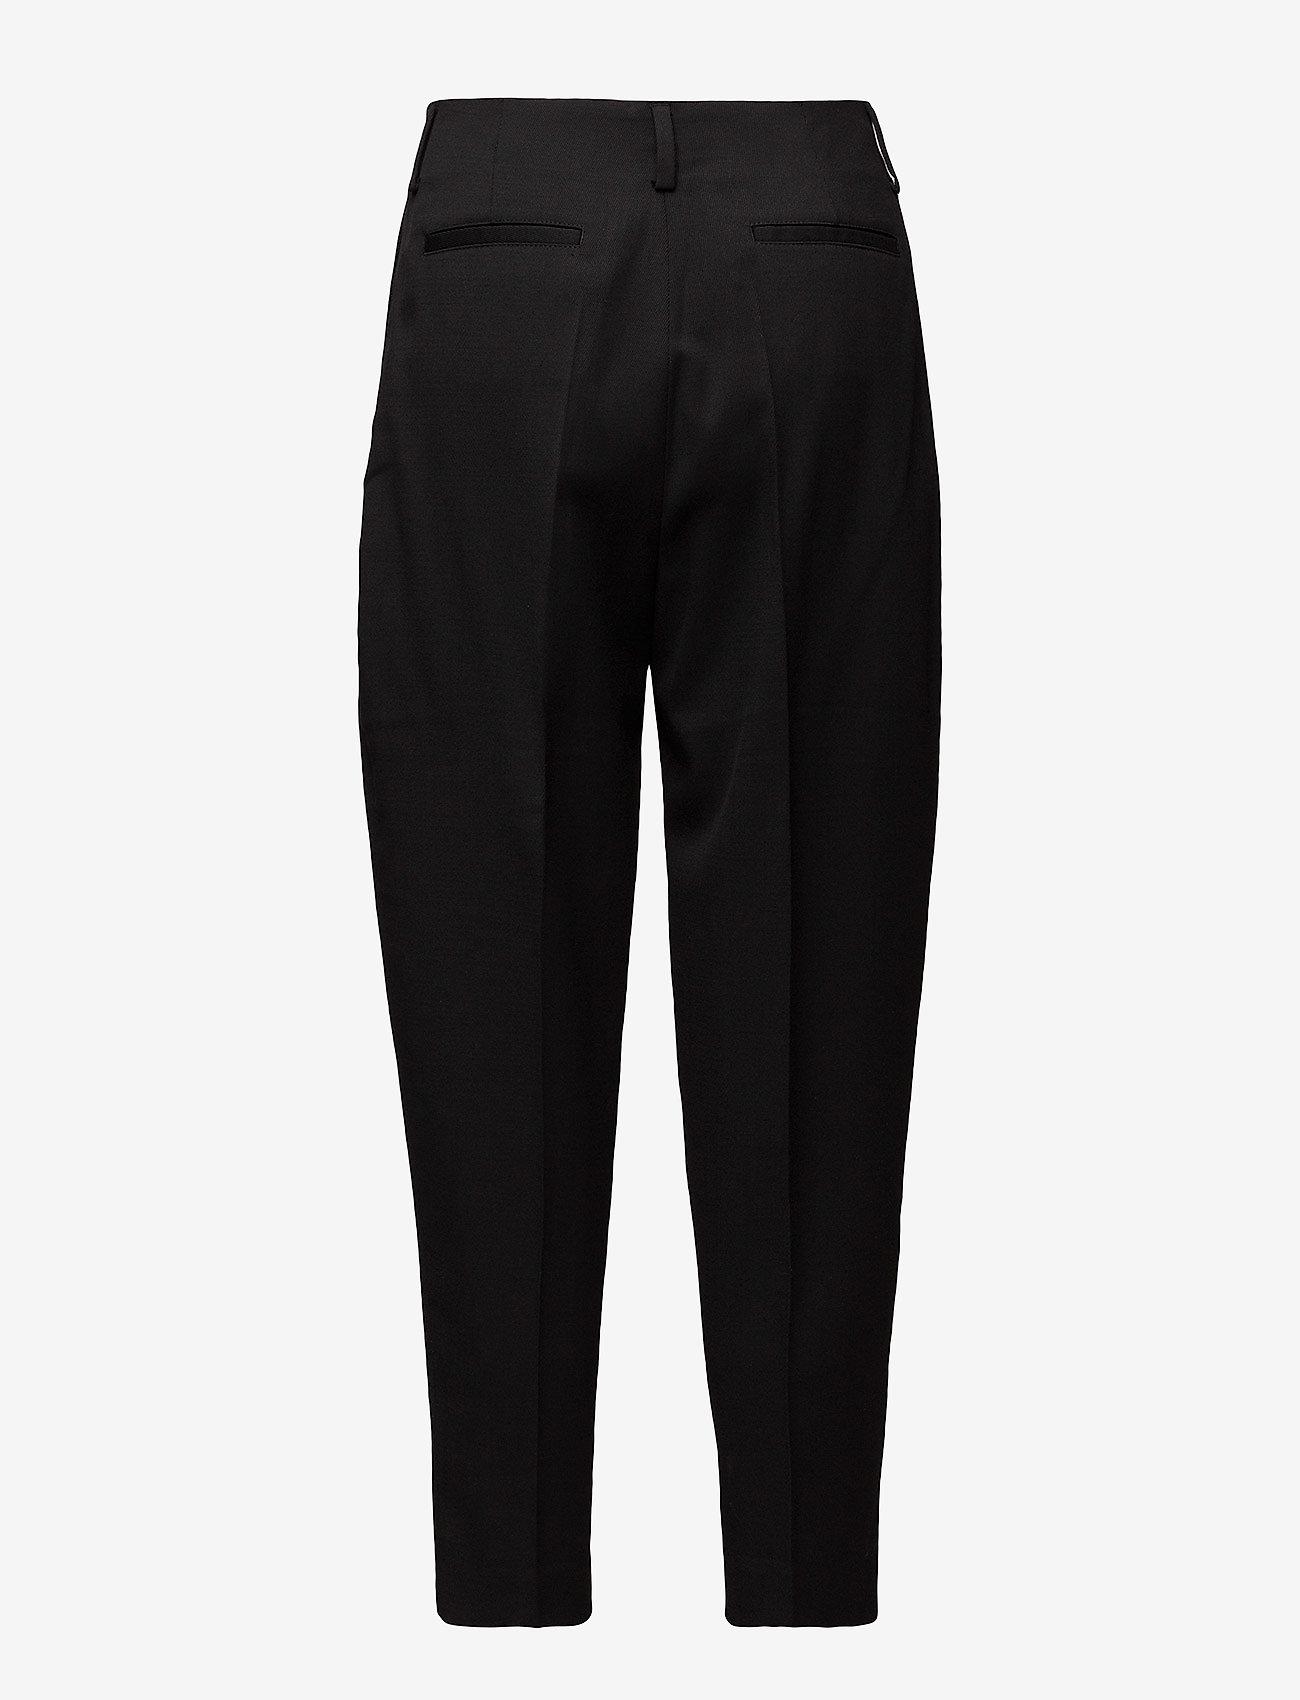 Filippa K - Karlie Trousers - straight leg trousers - black - 1